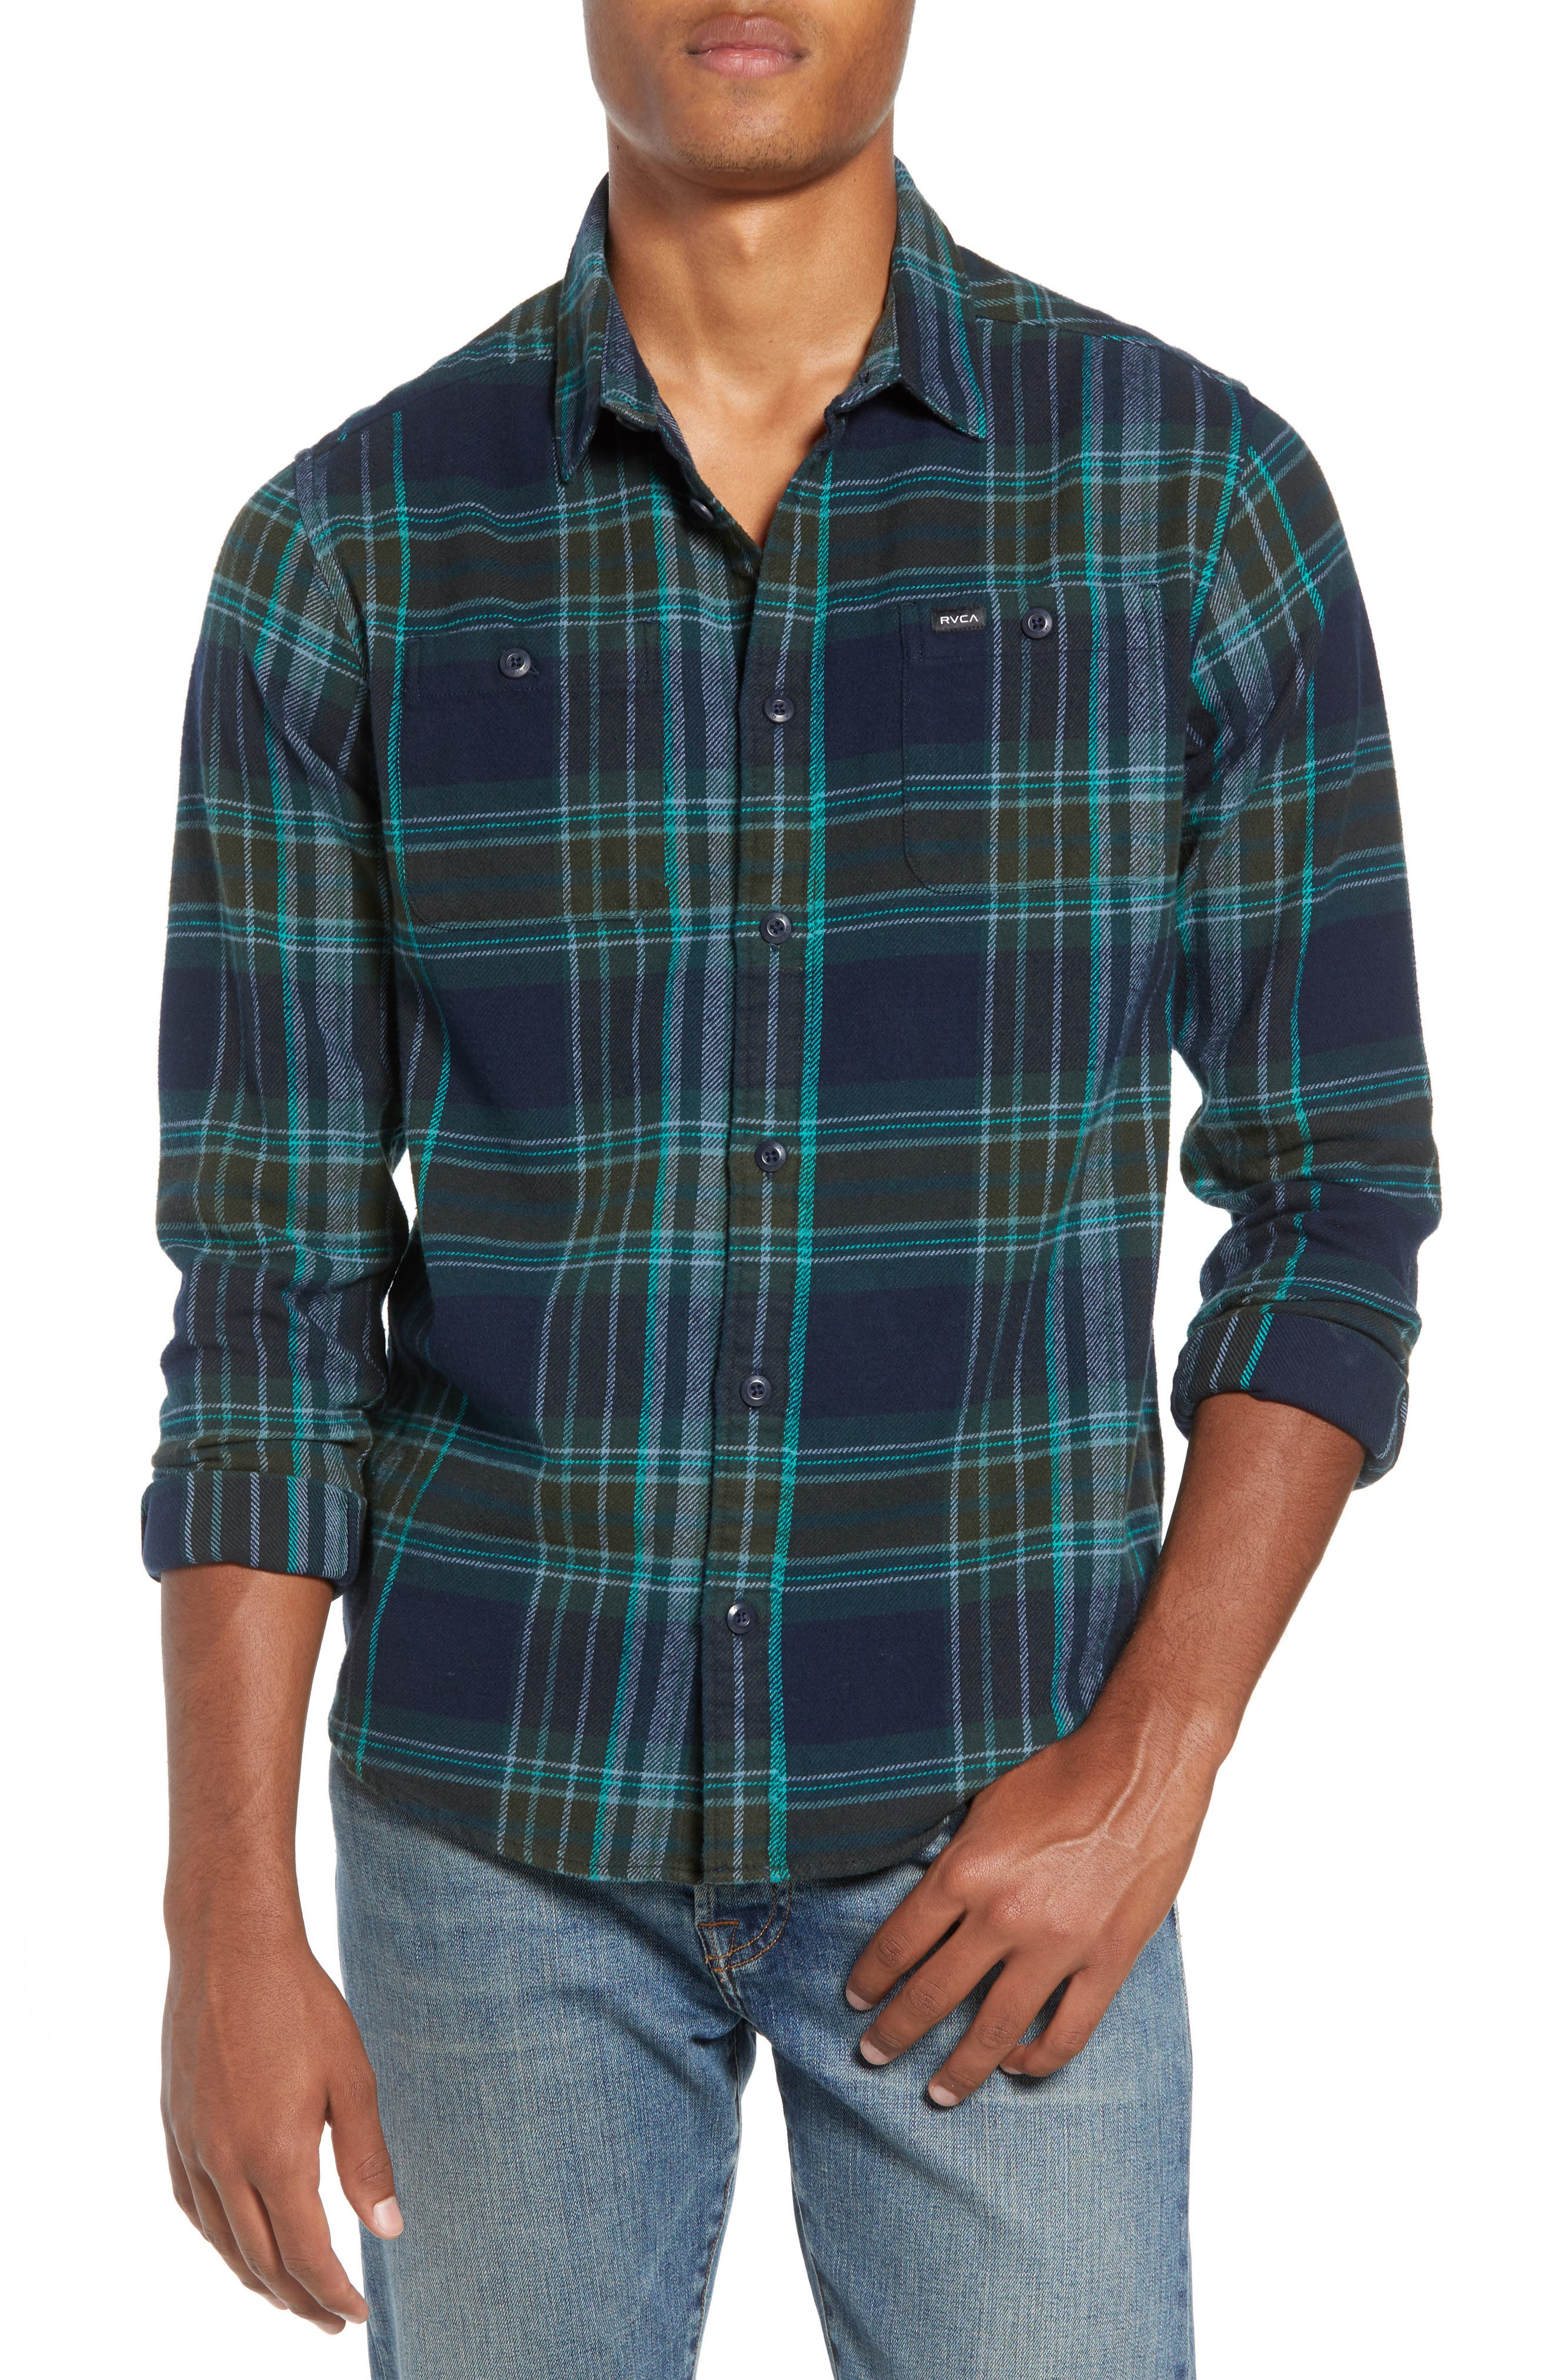 Rvca Ludlow Plaid Flannel Shirt, Blue